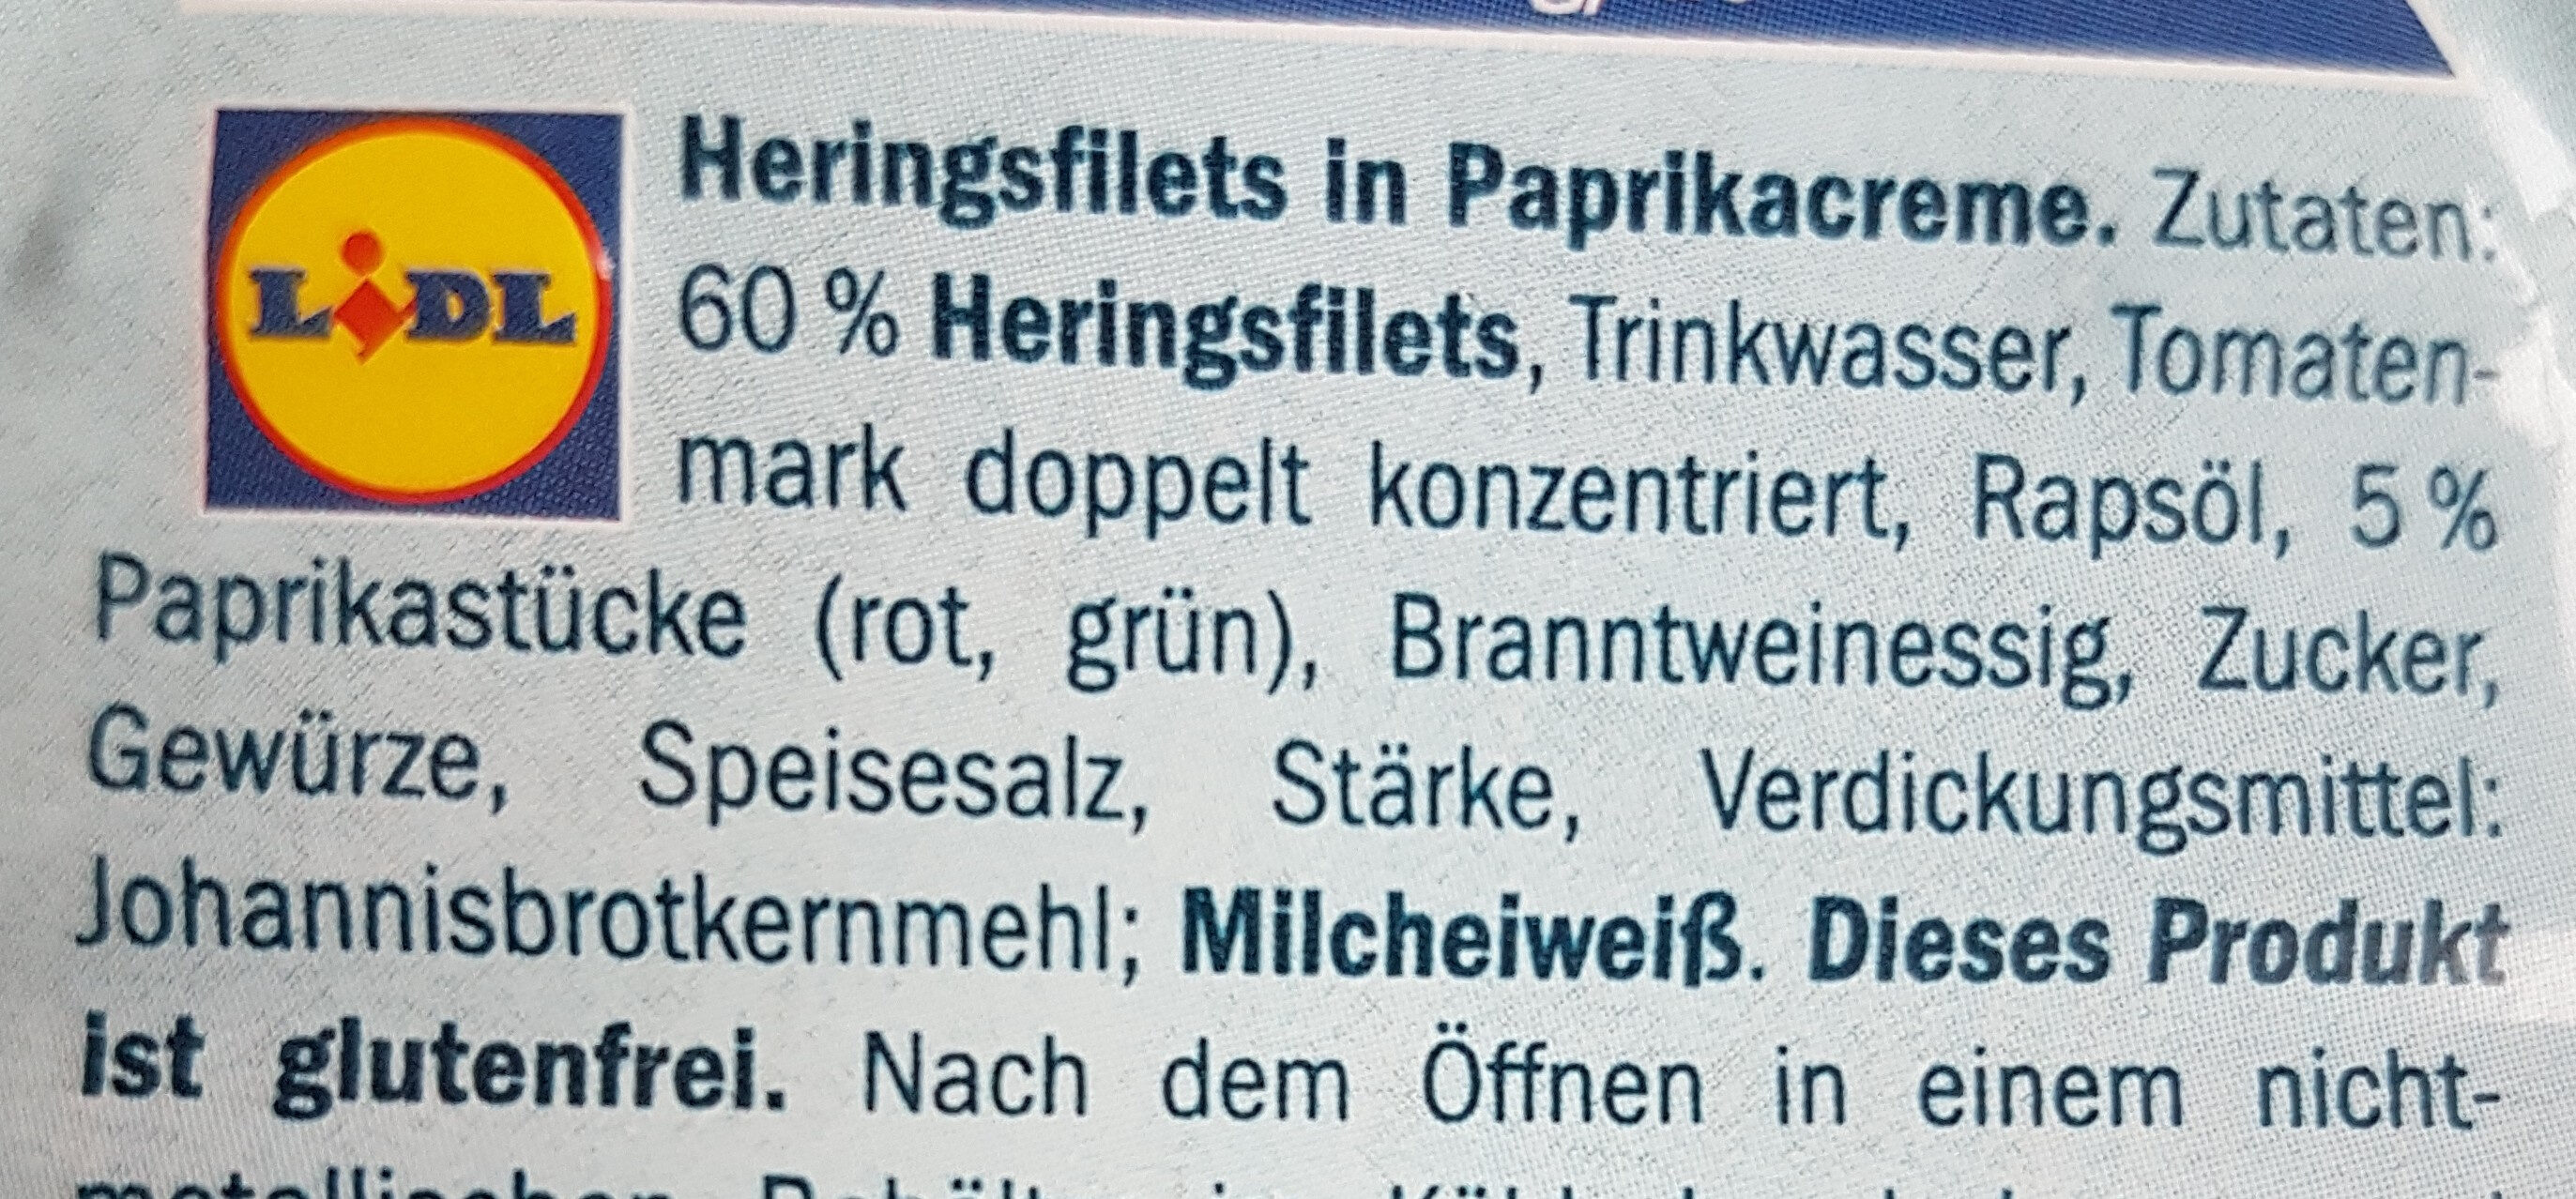 Heringsfilets in Paprikacreme - Ingredienti - de